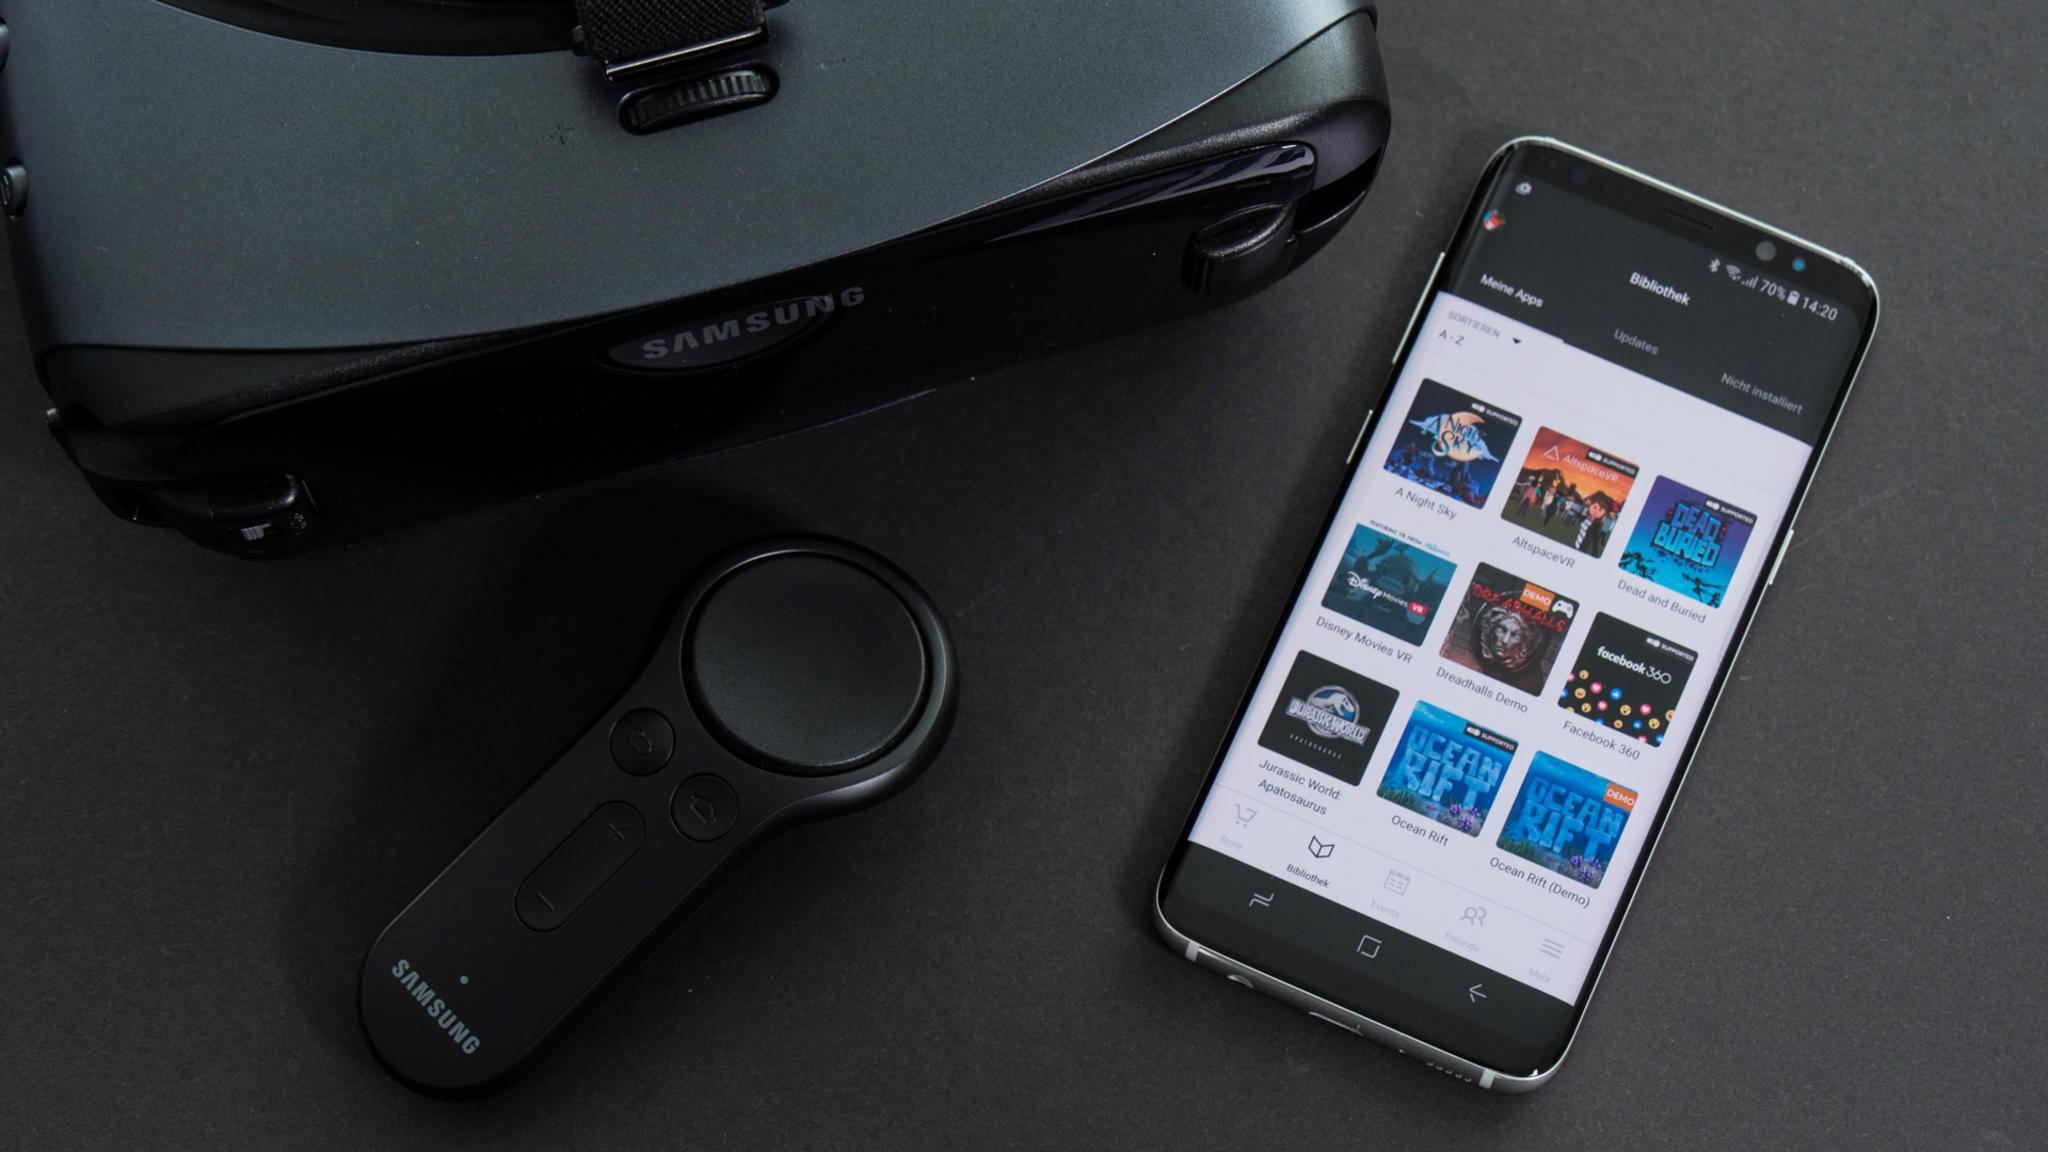 Neben den Gear-VR-Anwendungen soll das Galaxy S8 auch bald Google Daydream unterstützen.